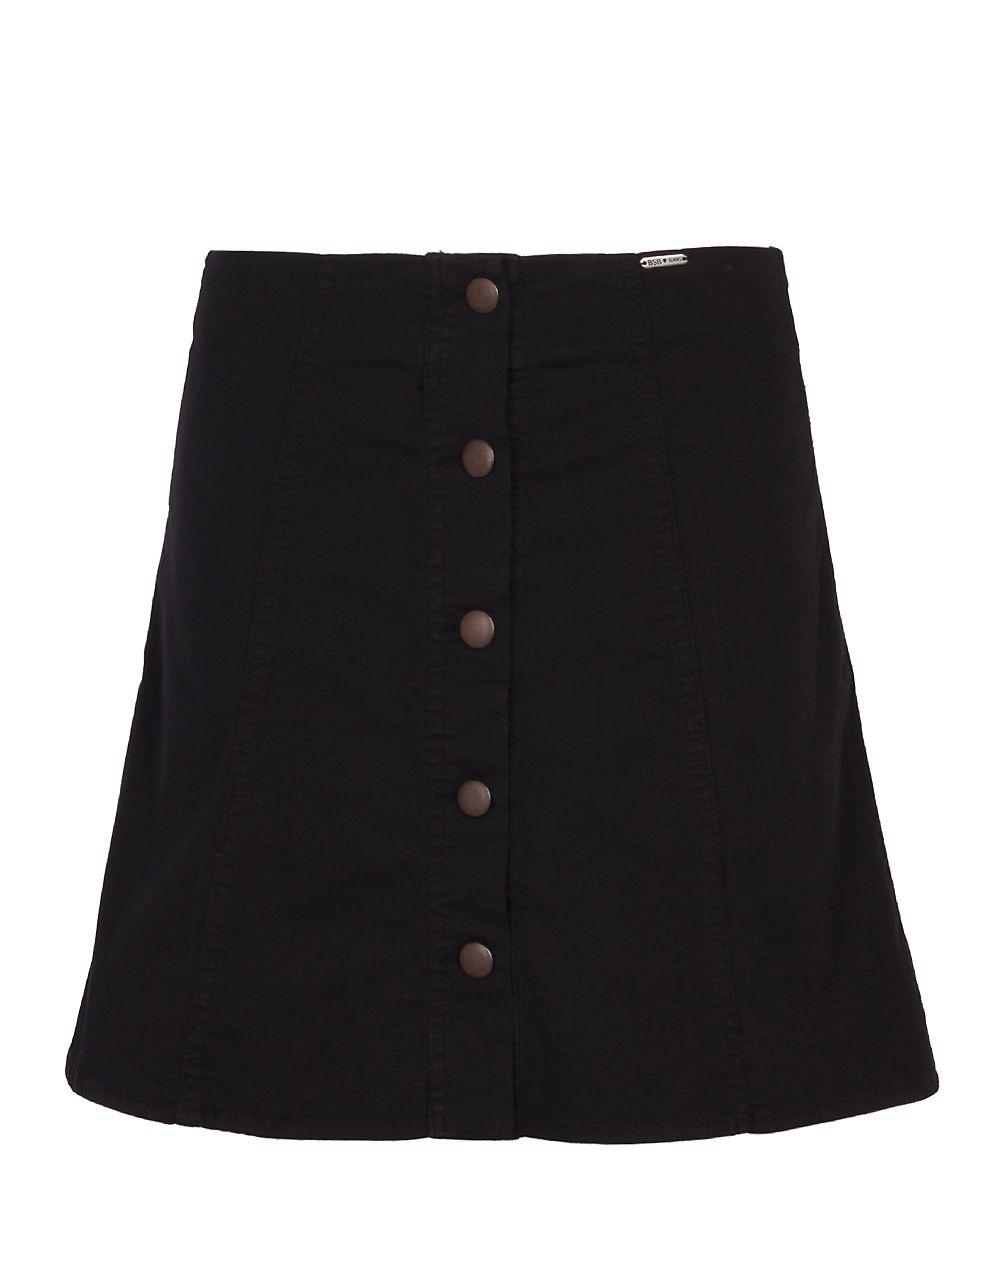 b20a5e4a812 10 μίνι φούστες που έχουμε ξεχωρίσει αυτό το καλοκαίρι (από 11 ευρώ ...